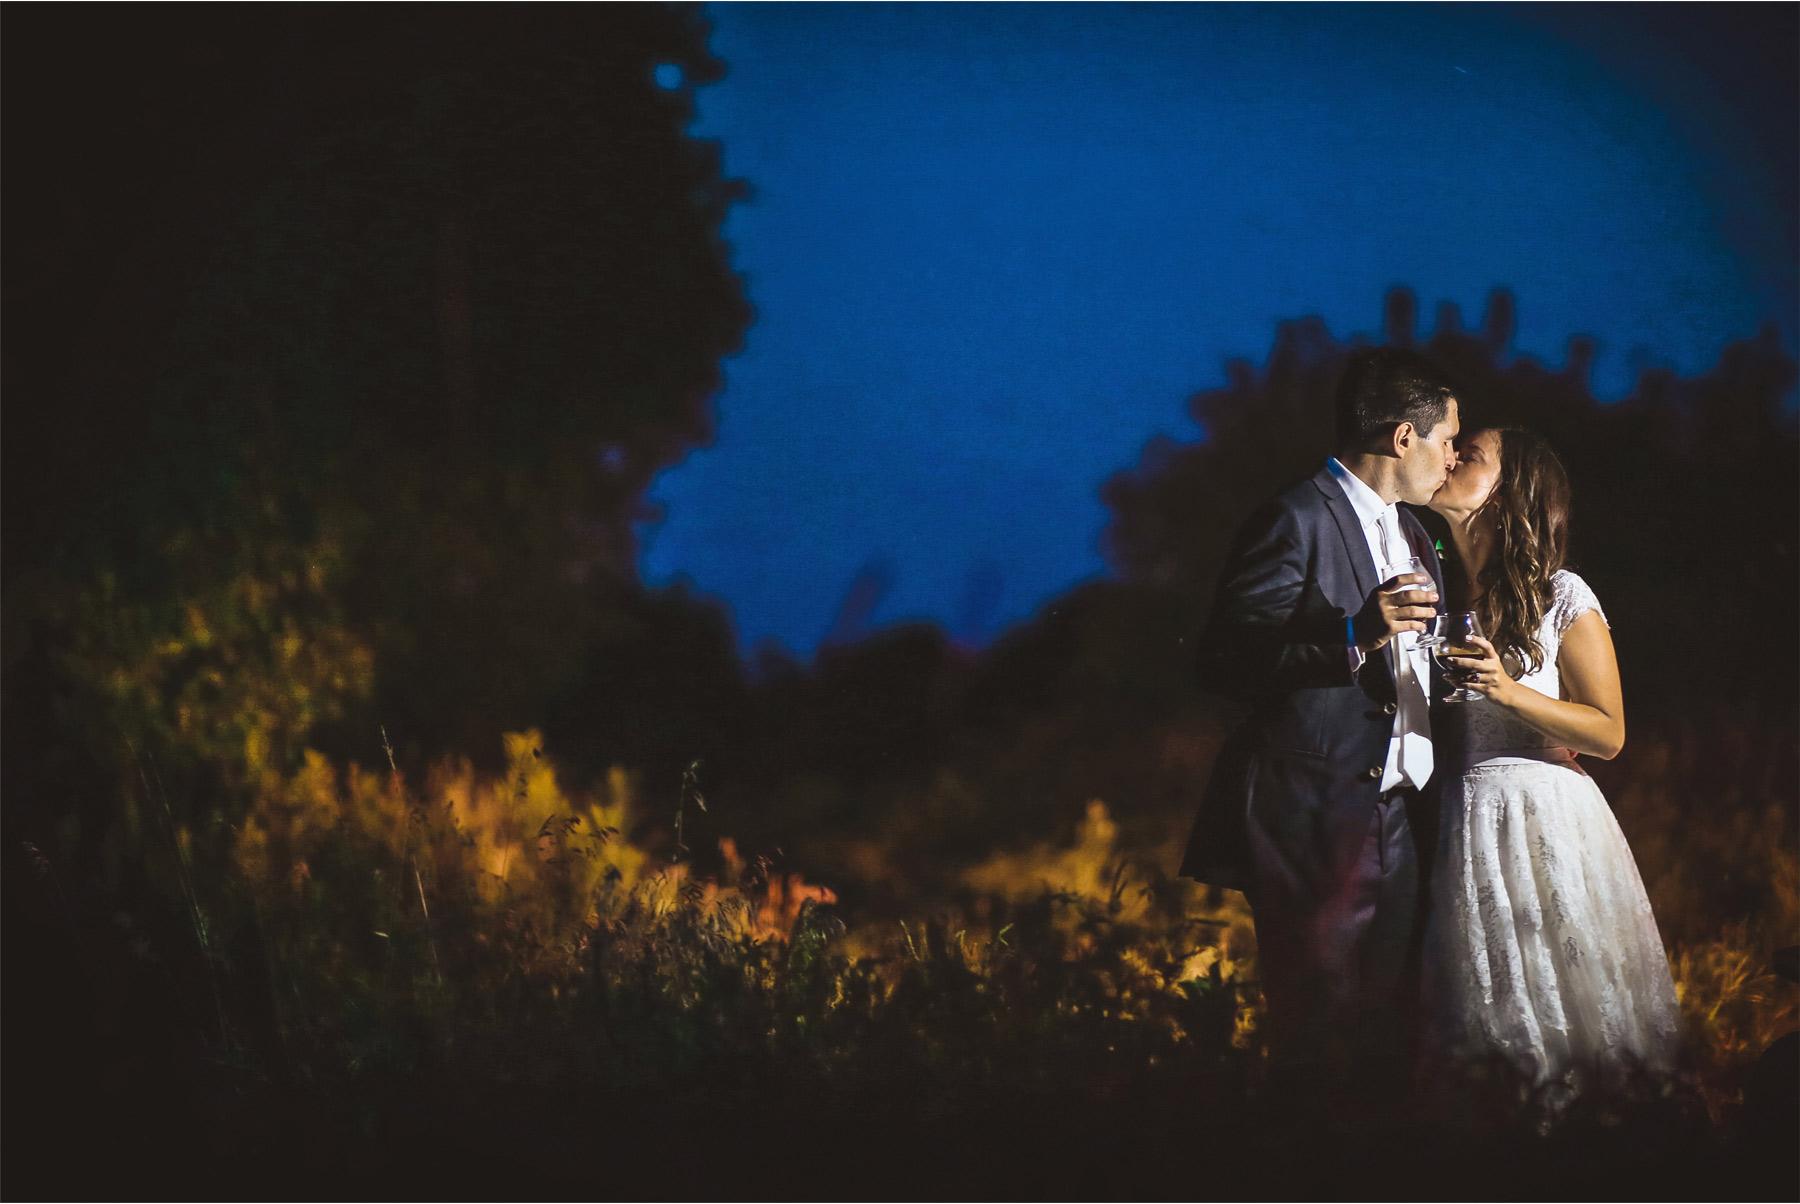 23-Weding-by-Vick-Photography-Minneapolis-Minnesota-Bavaria-Downs-Summer-Night-Bride-Groom-Rebecca-and-Mark.jpg